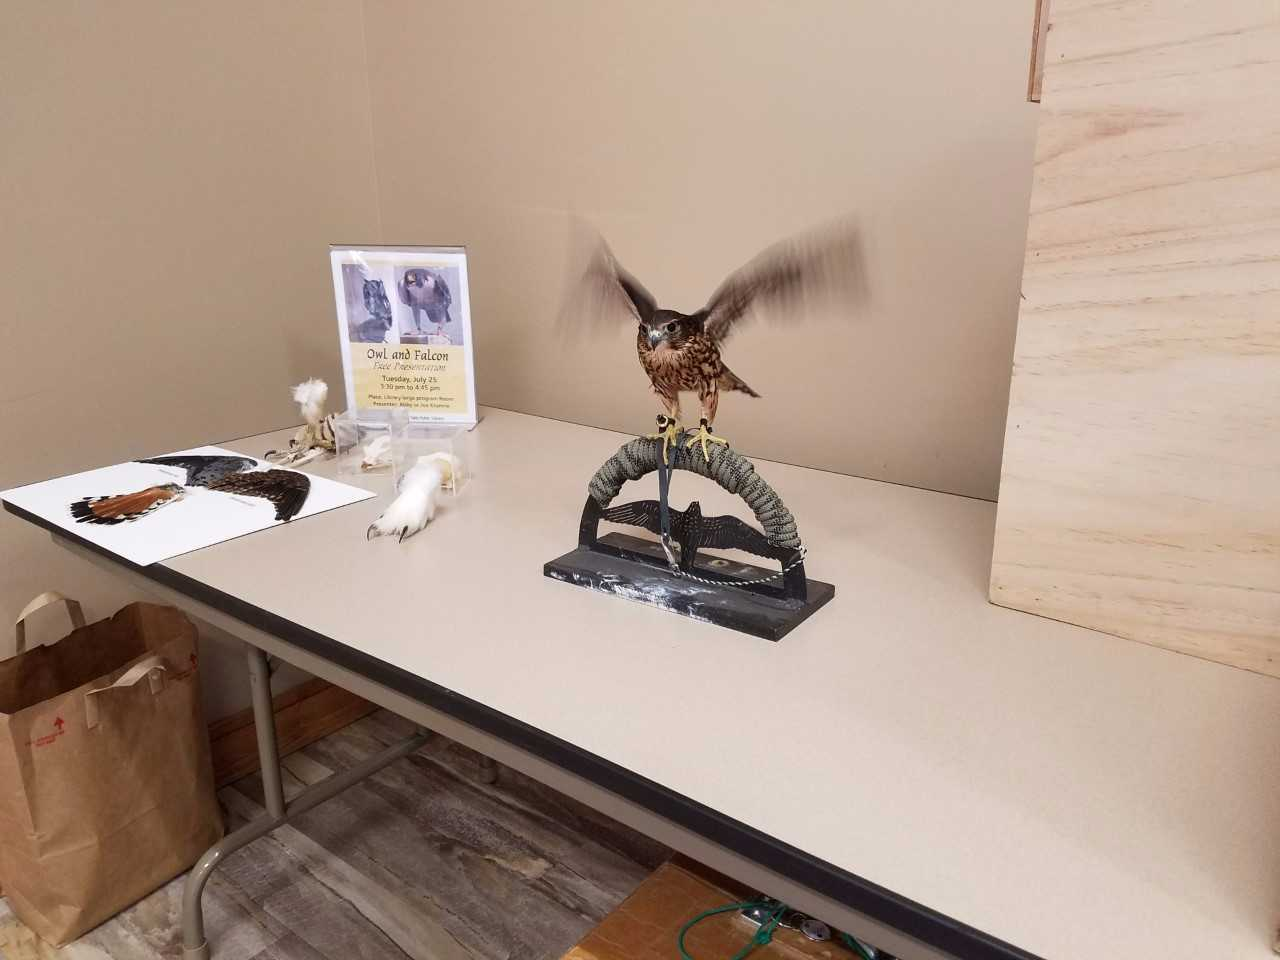 'Owl and Falcon' Program